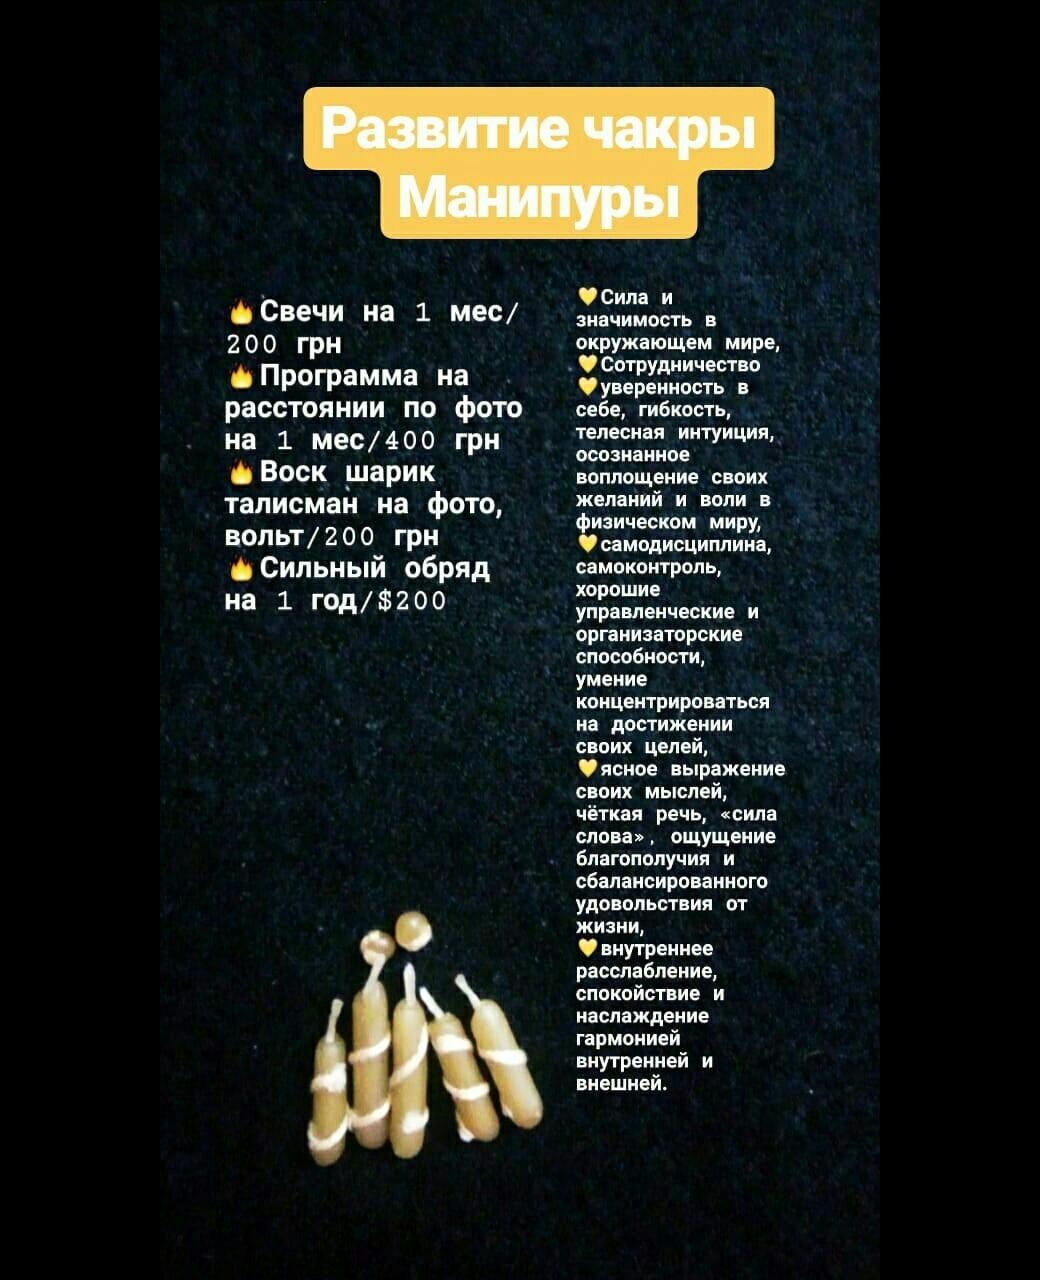 Хештег анахата на   Салон Магии и мистики Елены Руденко ( Валтеи ). Киев ,тел: 0506251562  MV7FngTF8JY